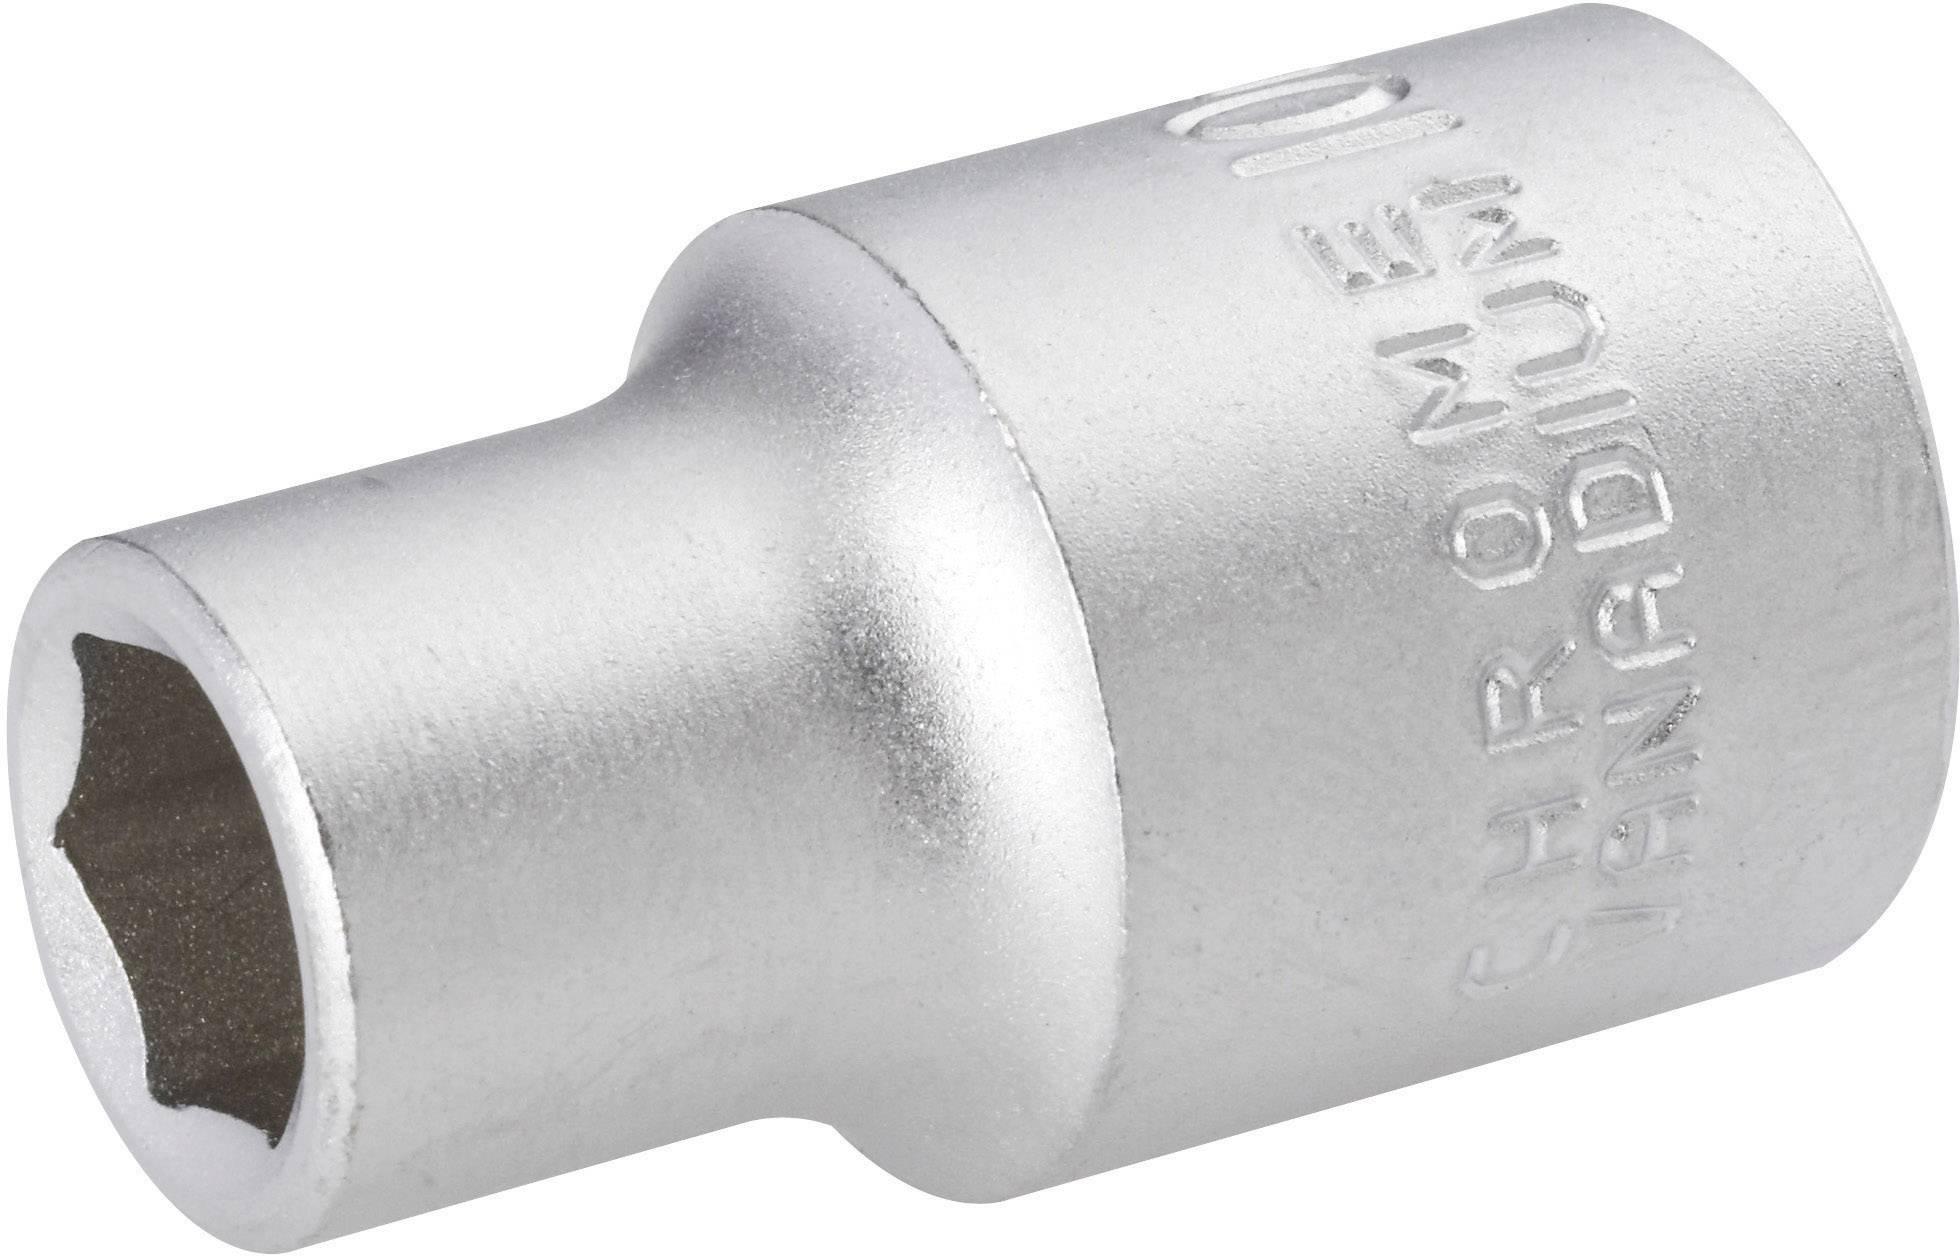 "Nadstavec na račňu TOOLCRAFT 820772, 1/2"" (12.5 mm), 18 mm"